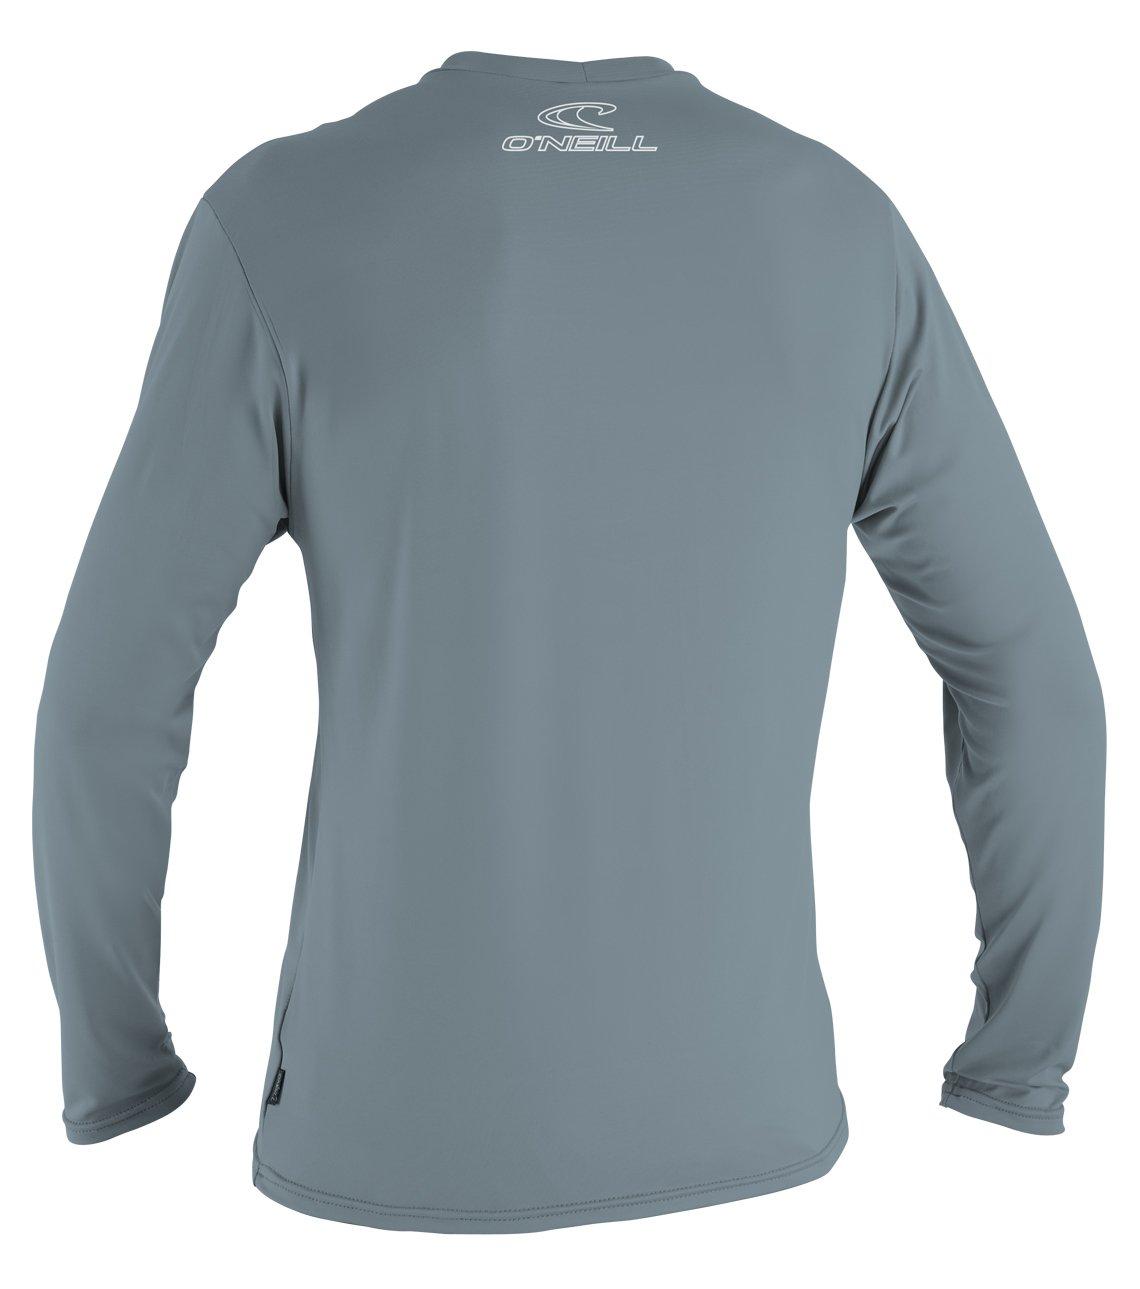 O'Neill Wetsuits Men's Basic Skins UPF 50+ Long Sleeve Sun Shirt, Dusty Blue, Medium by O'Neill Wetsuits (Image #2)